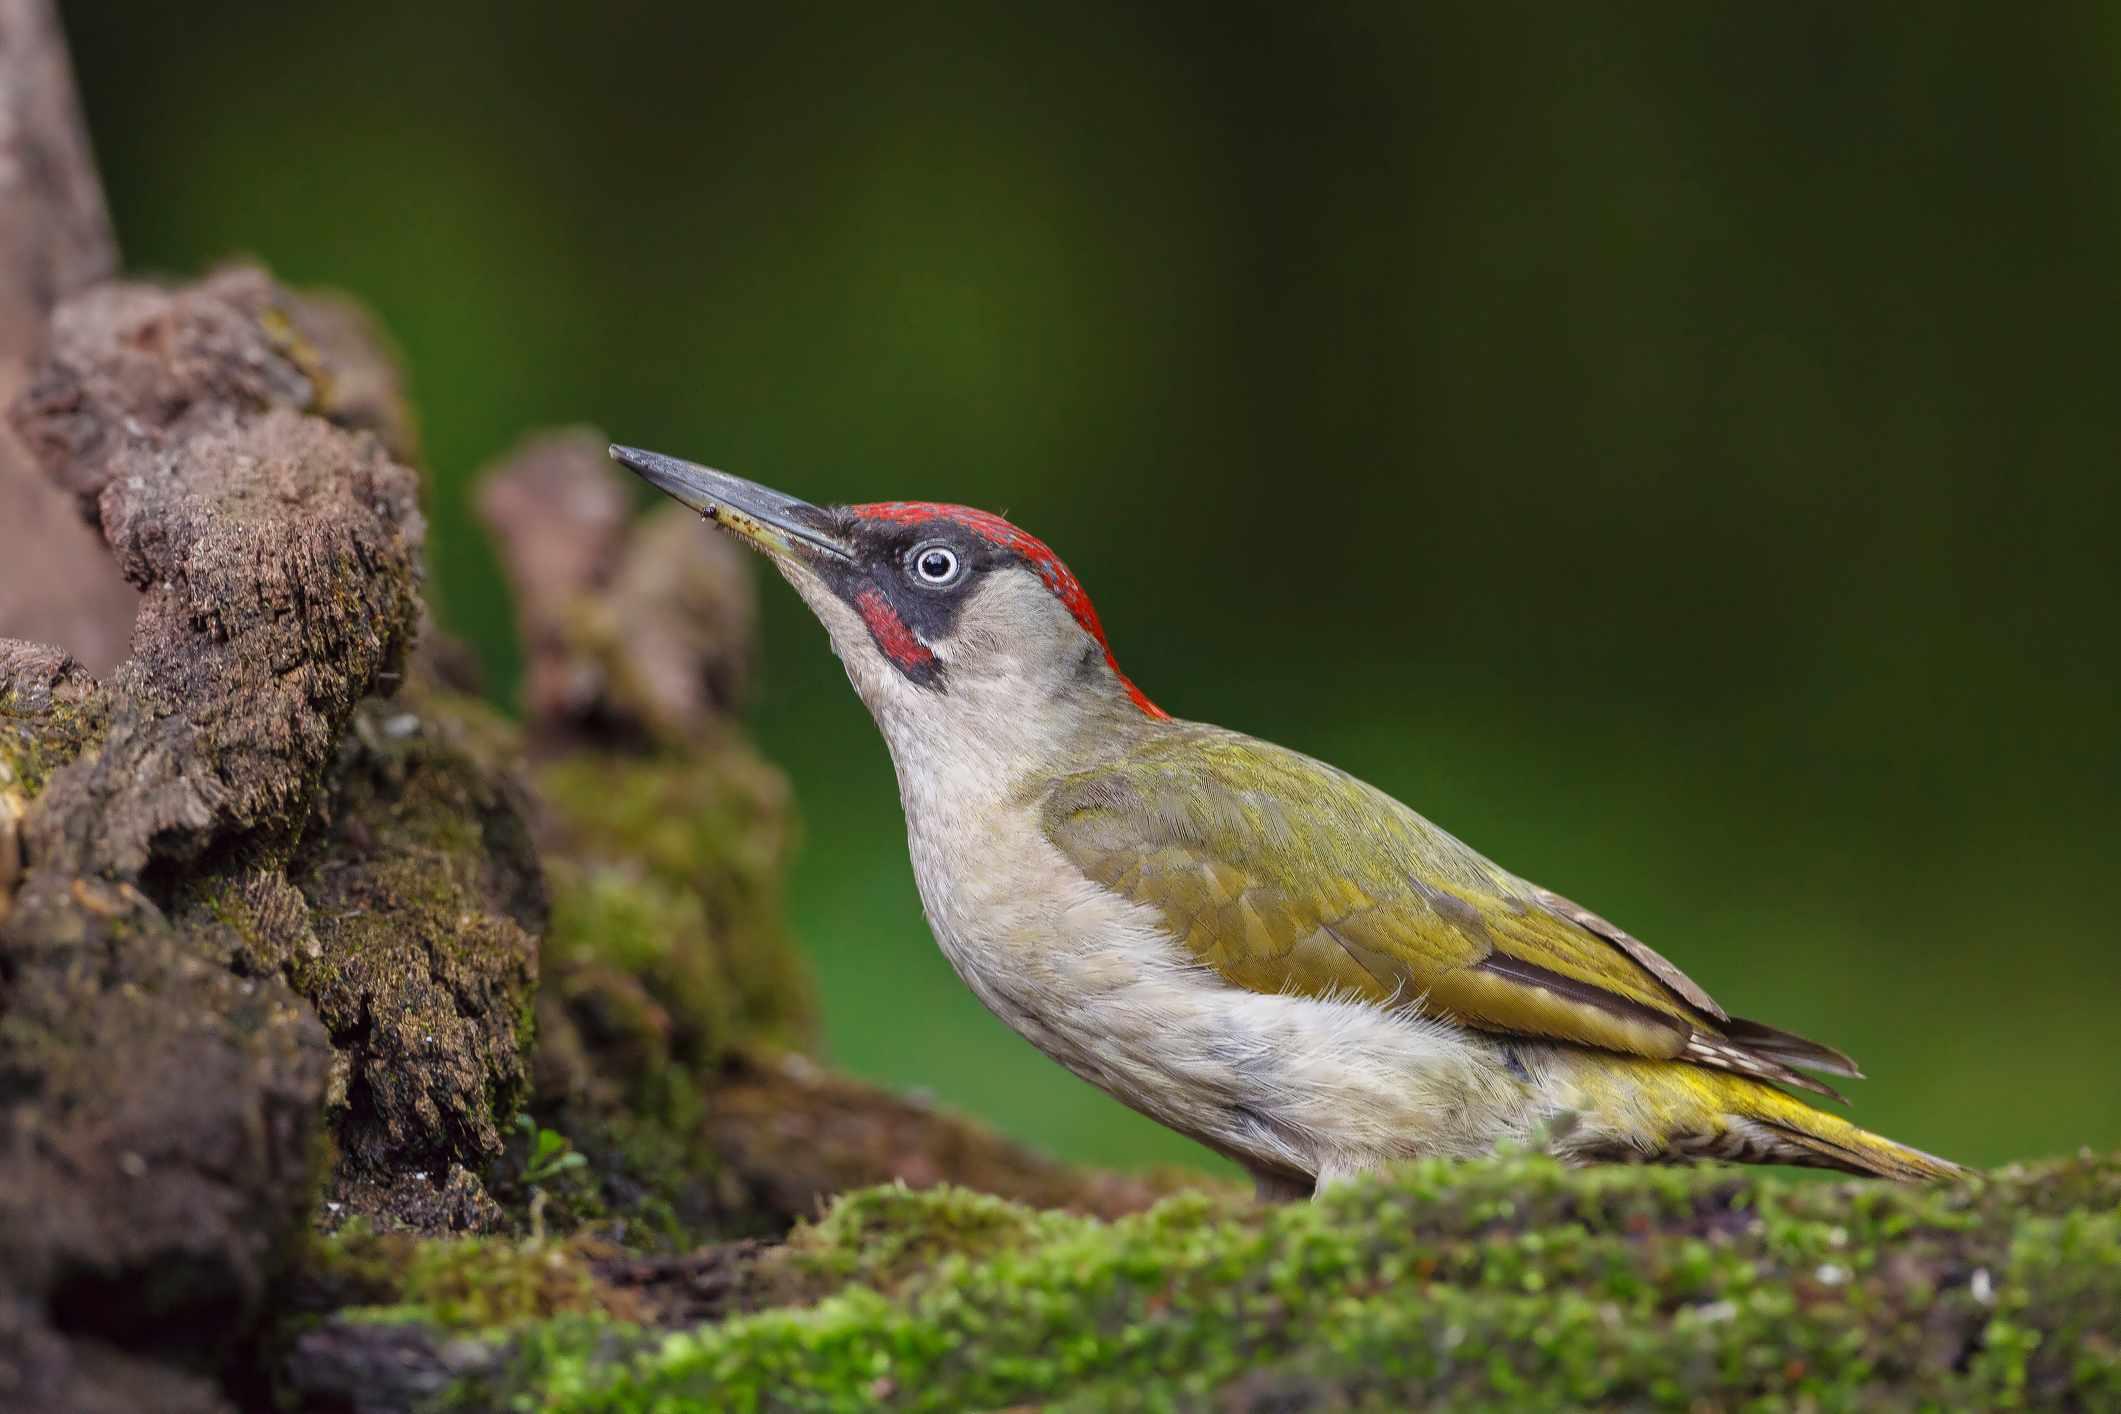 European green woodpecker (Picus viridis). © Gerhard Kummer/Getty